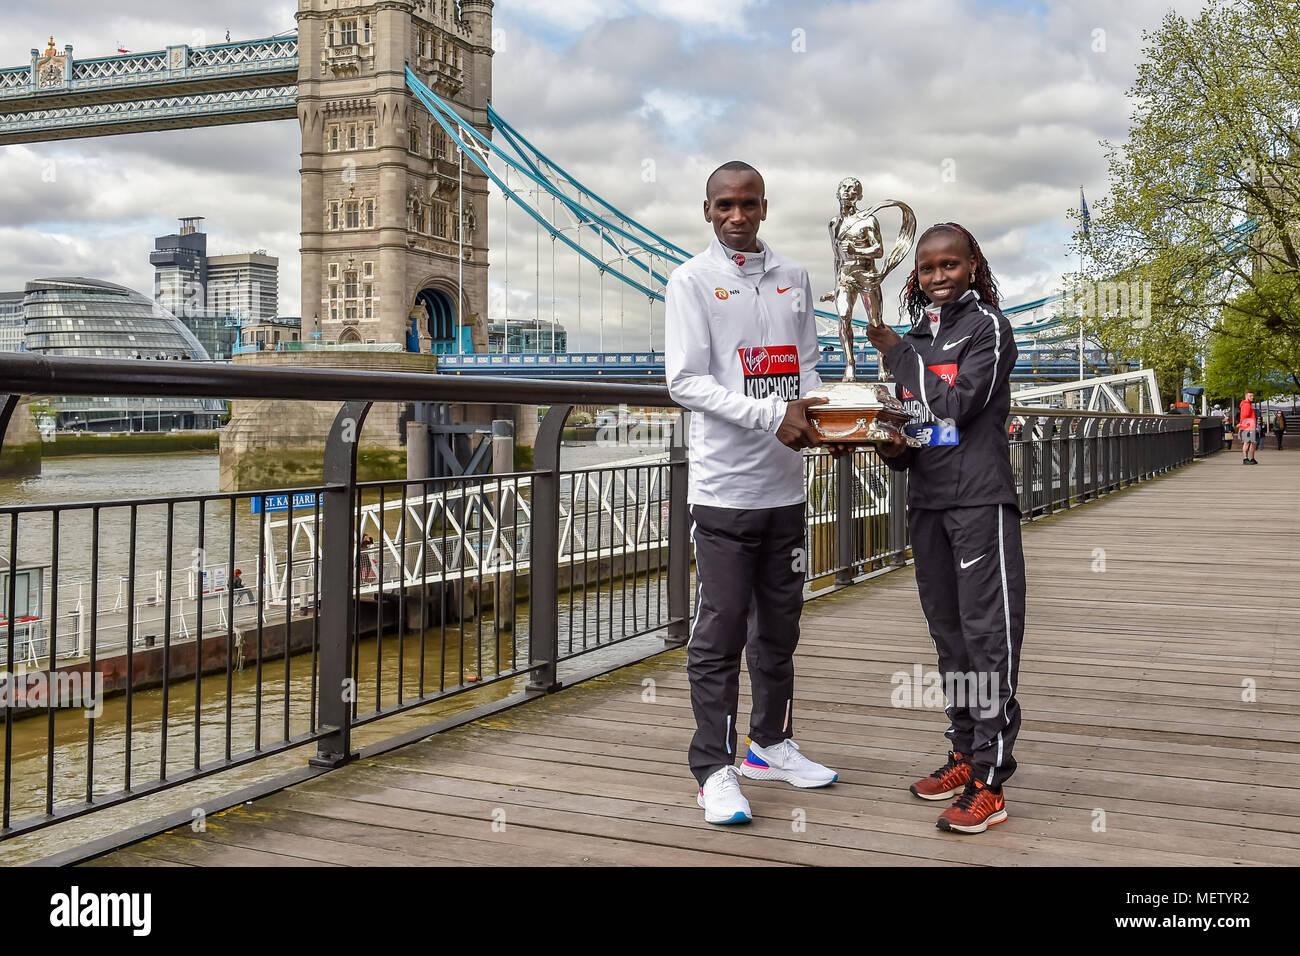 London, UK. 23rd April, 2018. Eliud Kipchoge (KEN) and Vivian Cheruiyot (KEN) at Winners presentation after the 2018 Virgin Money London Marathon on Monday, 23 April 2018. London, England. Credit: Taka Wu/Alamy Live News Stock Photo